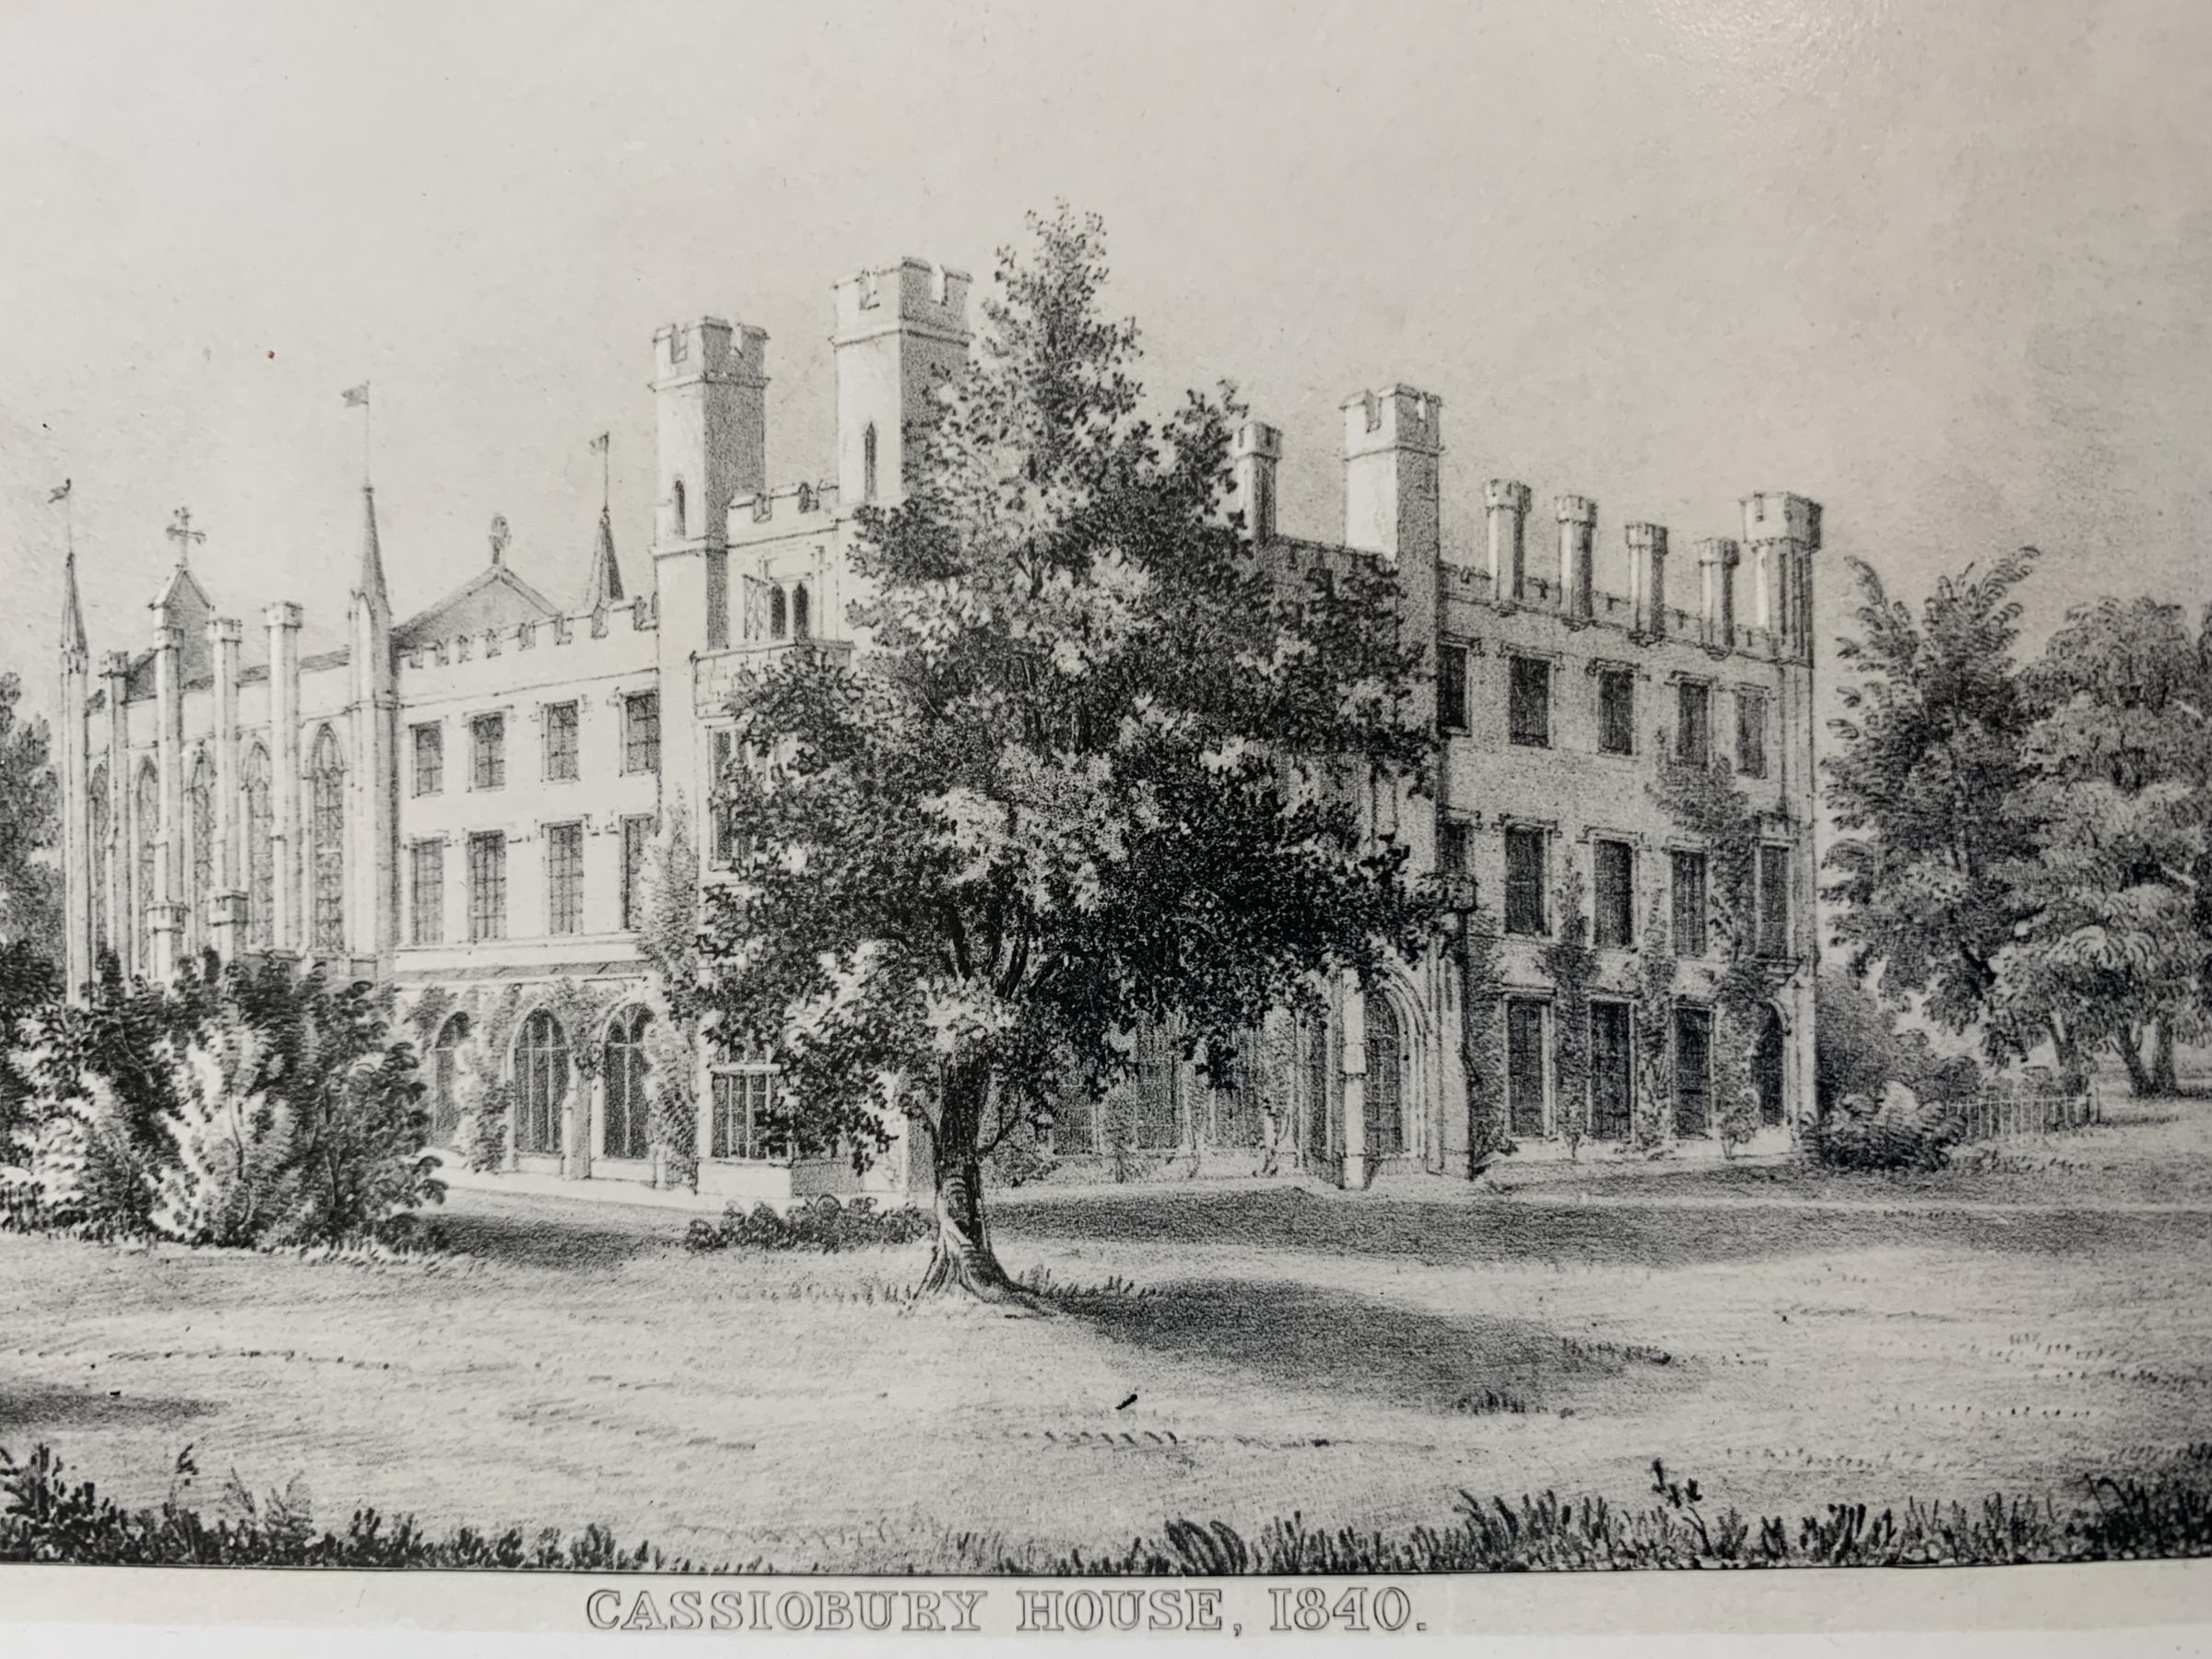 Cassiobury House 1840